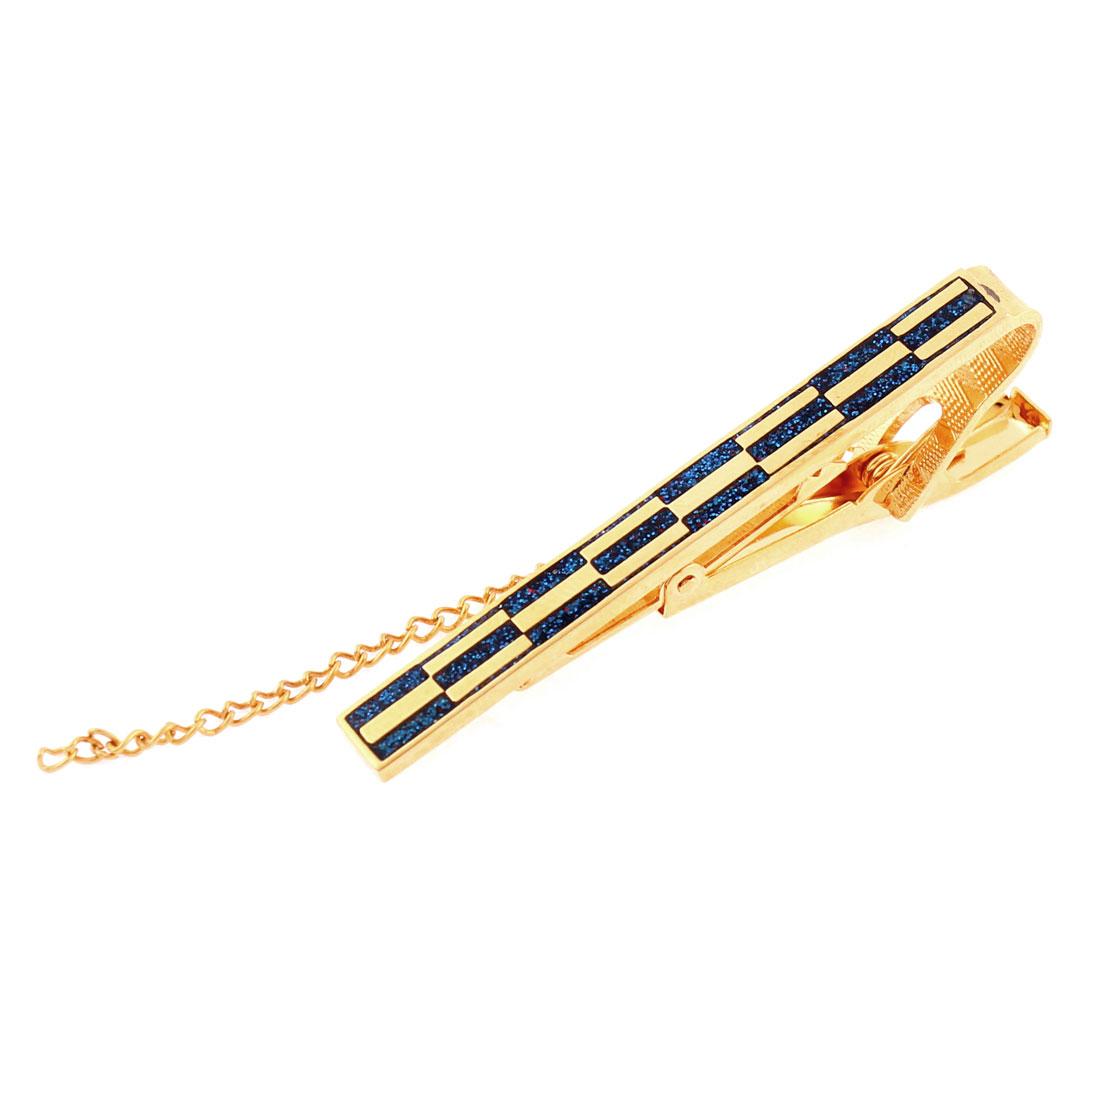 Man Metal Rectangle Stripe Pattern Necktie Clip Clasp 58mm Length